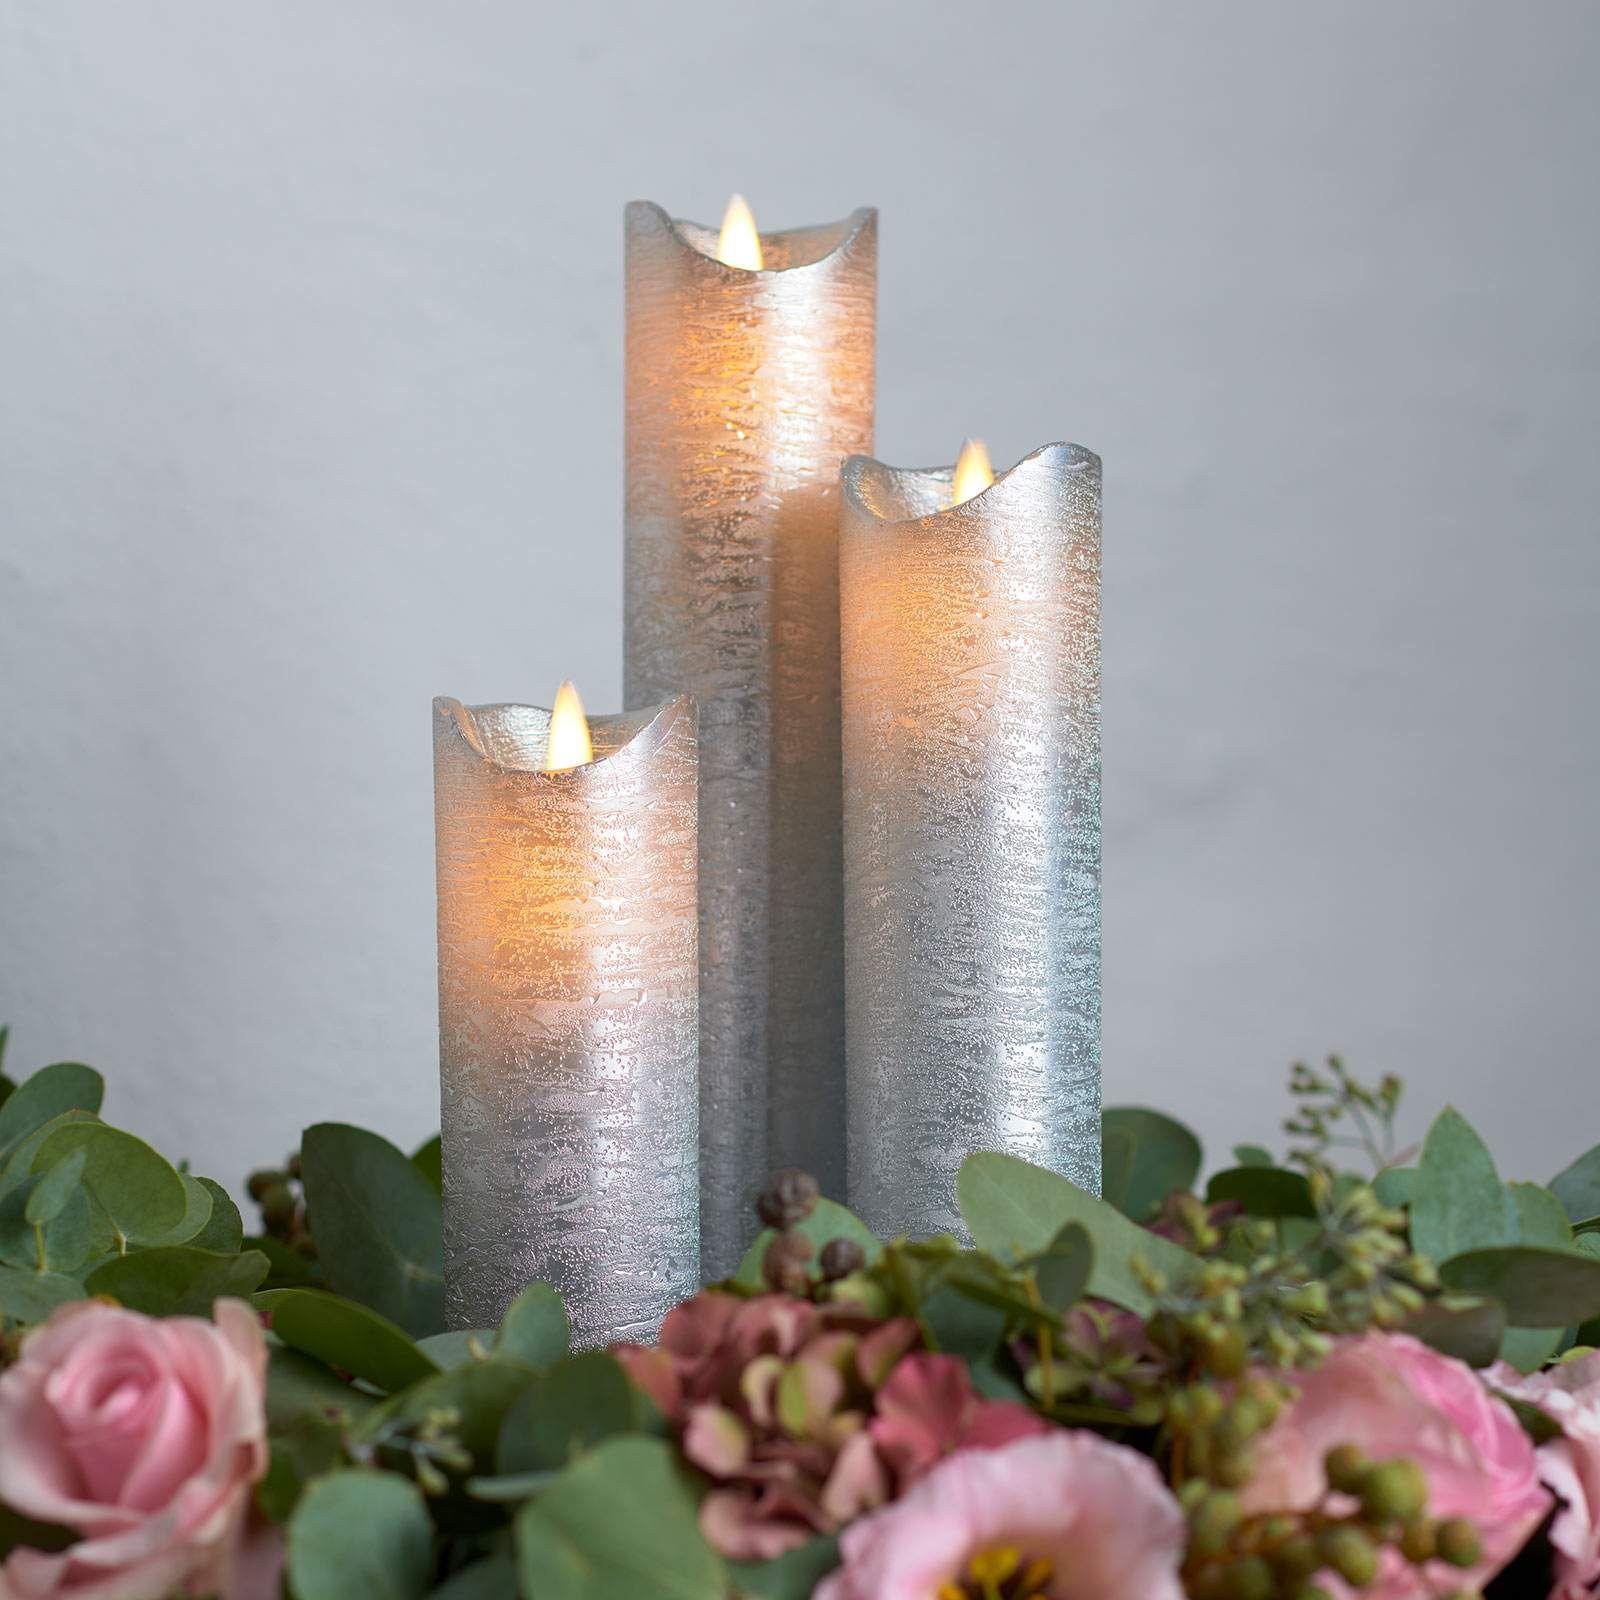 Led Kerze Sara Exclusive Von Sirius Silber Led Kerzen